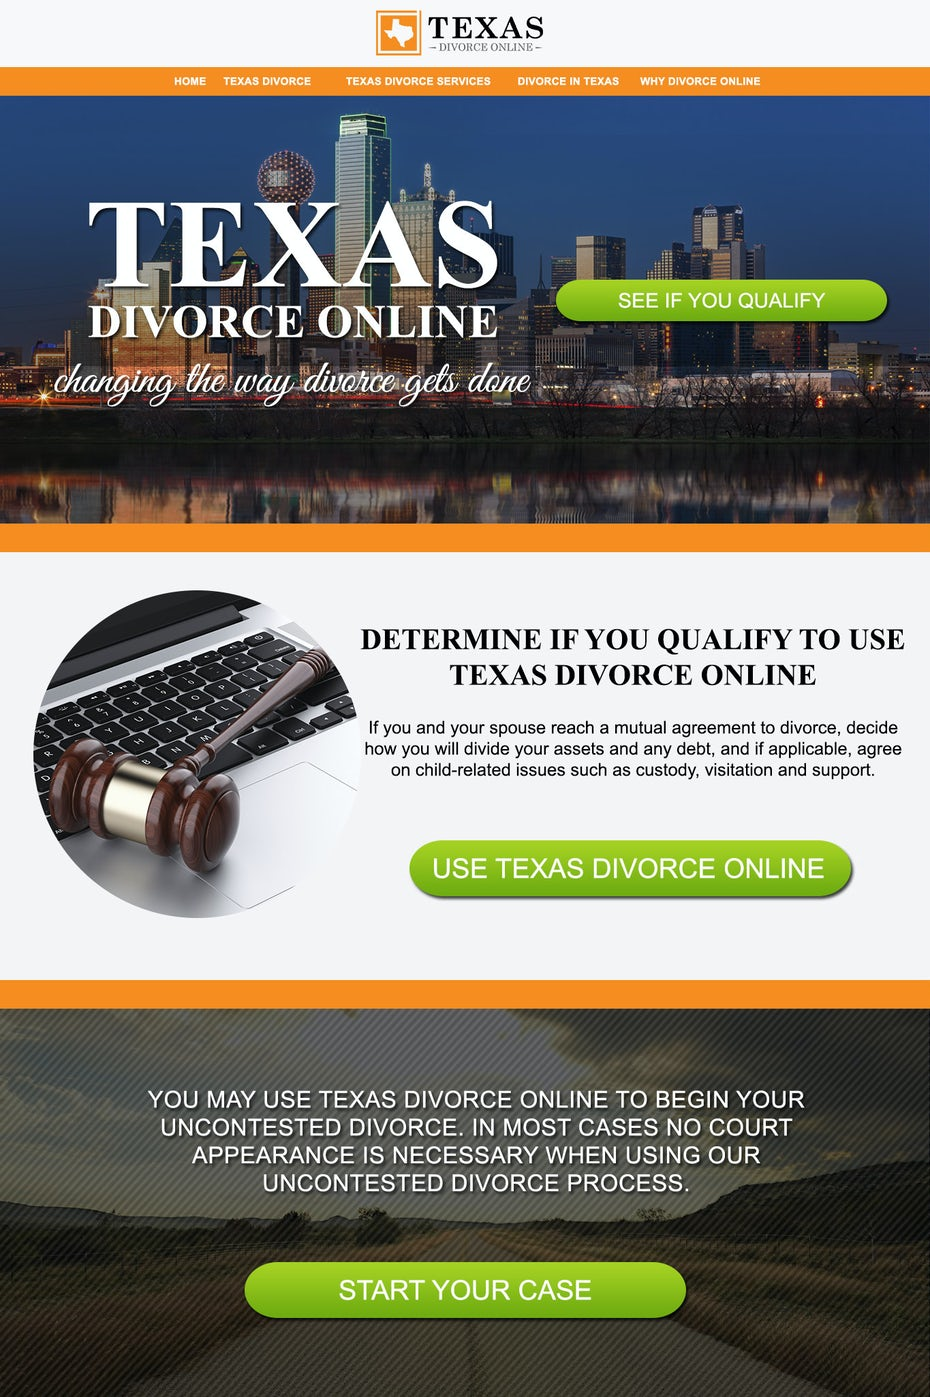 Divorce landing page